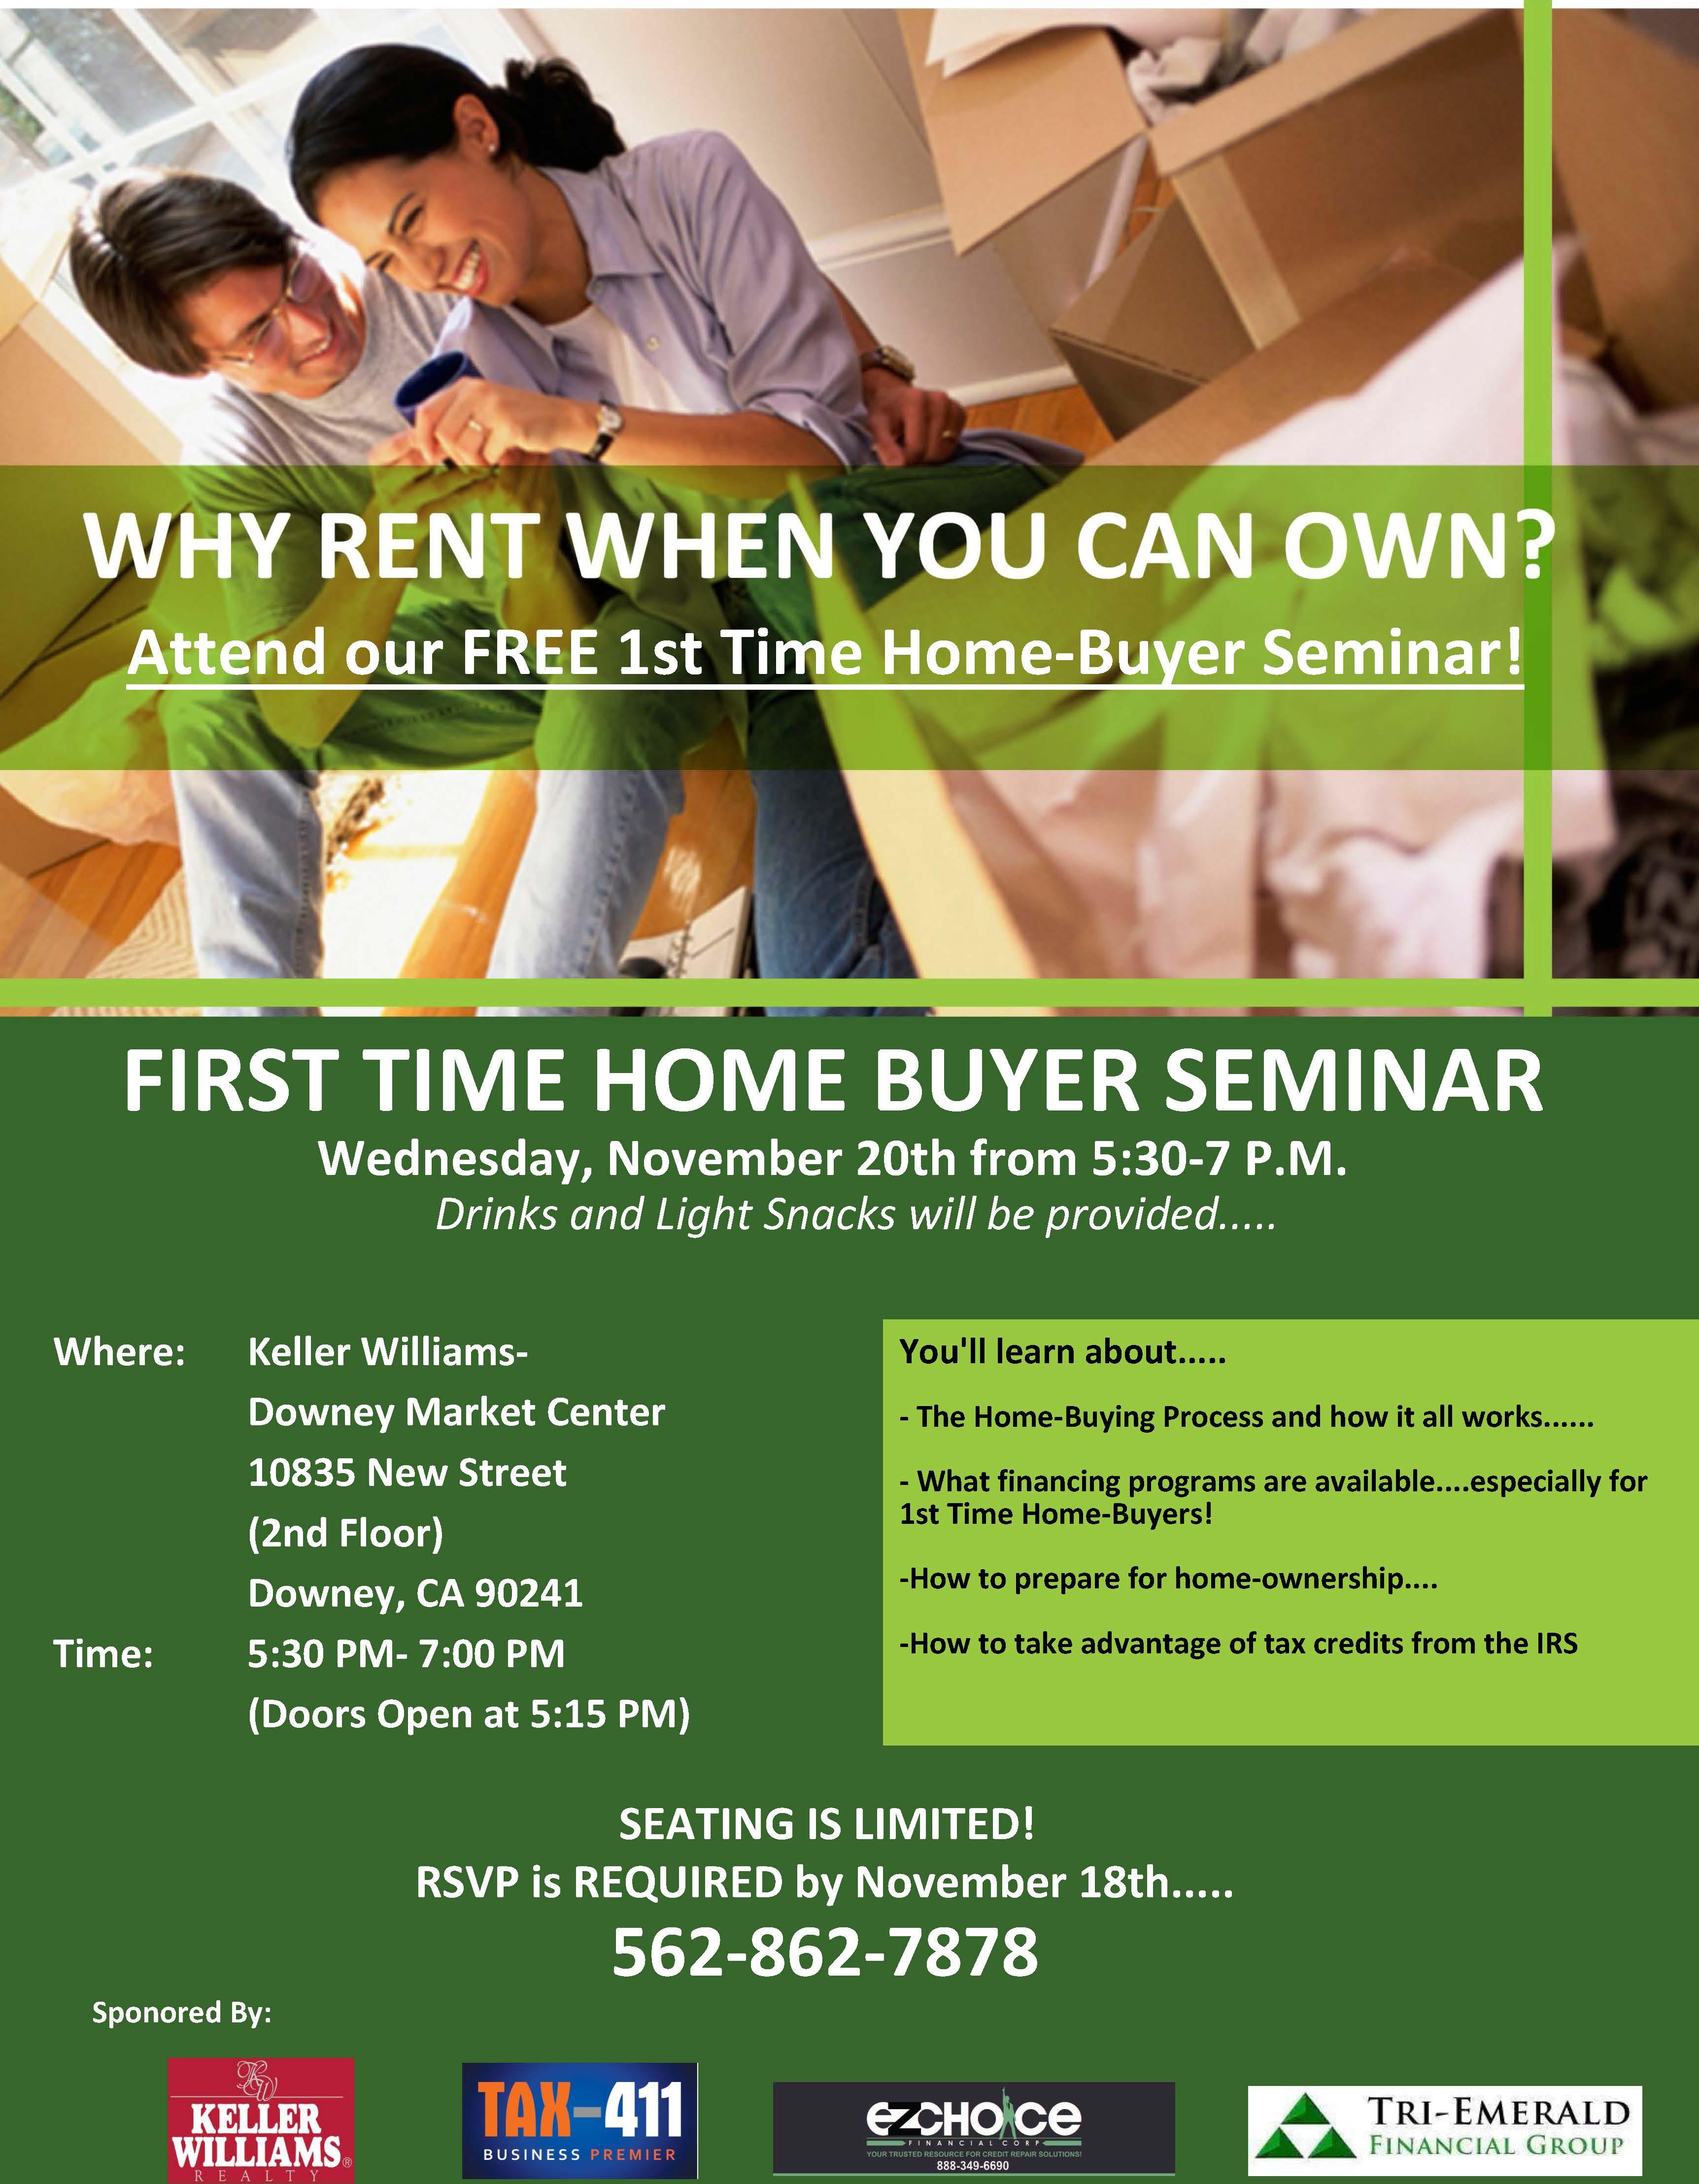 first time home buyer workshop in downey ca nov 20 2013 5 30 pm eventful. Black Bedroom Furniture Sets. Home Design Ideas